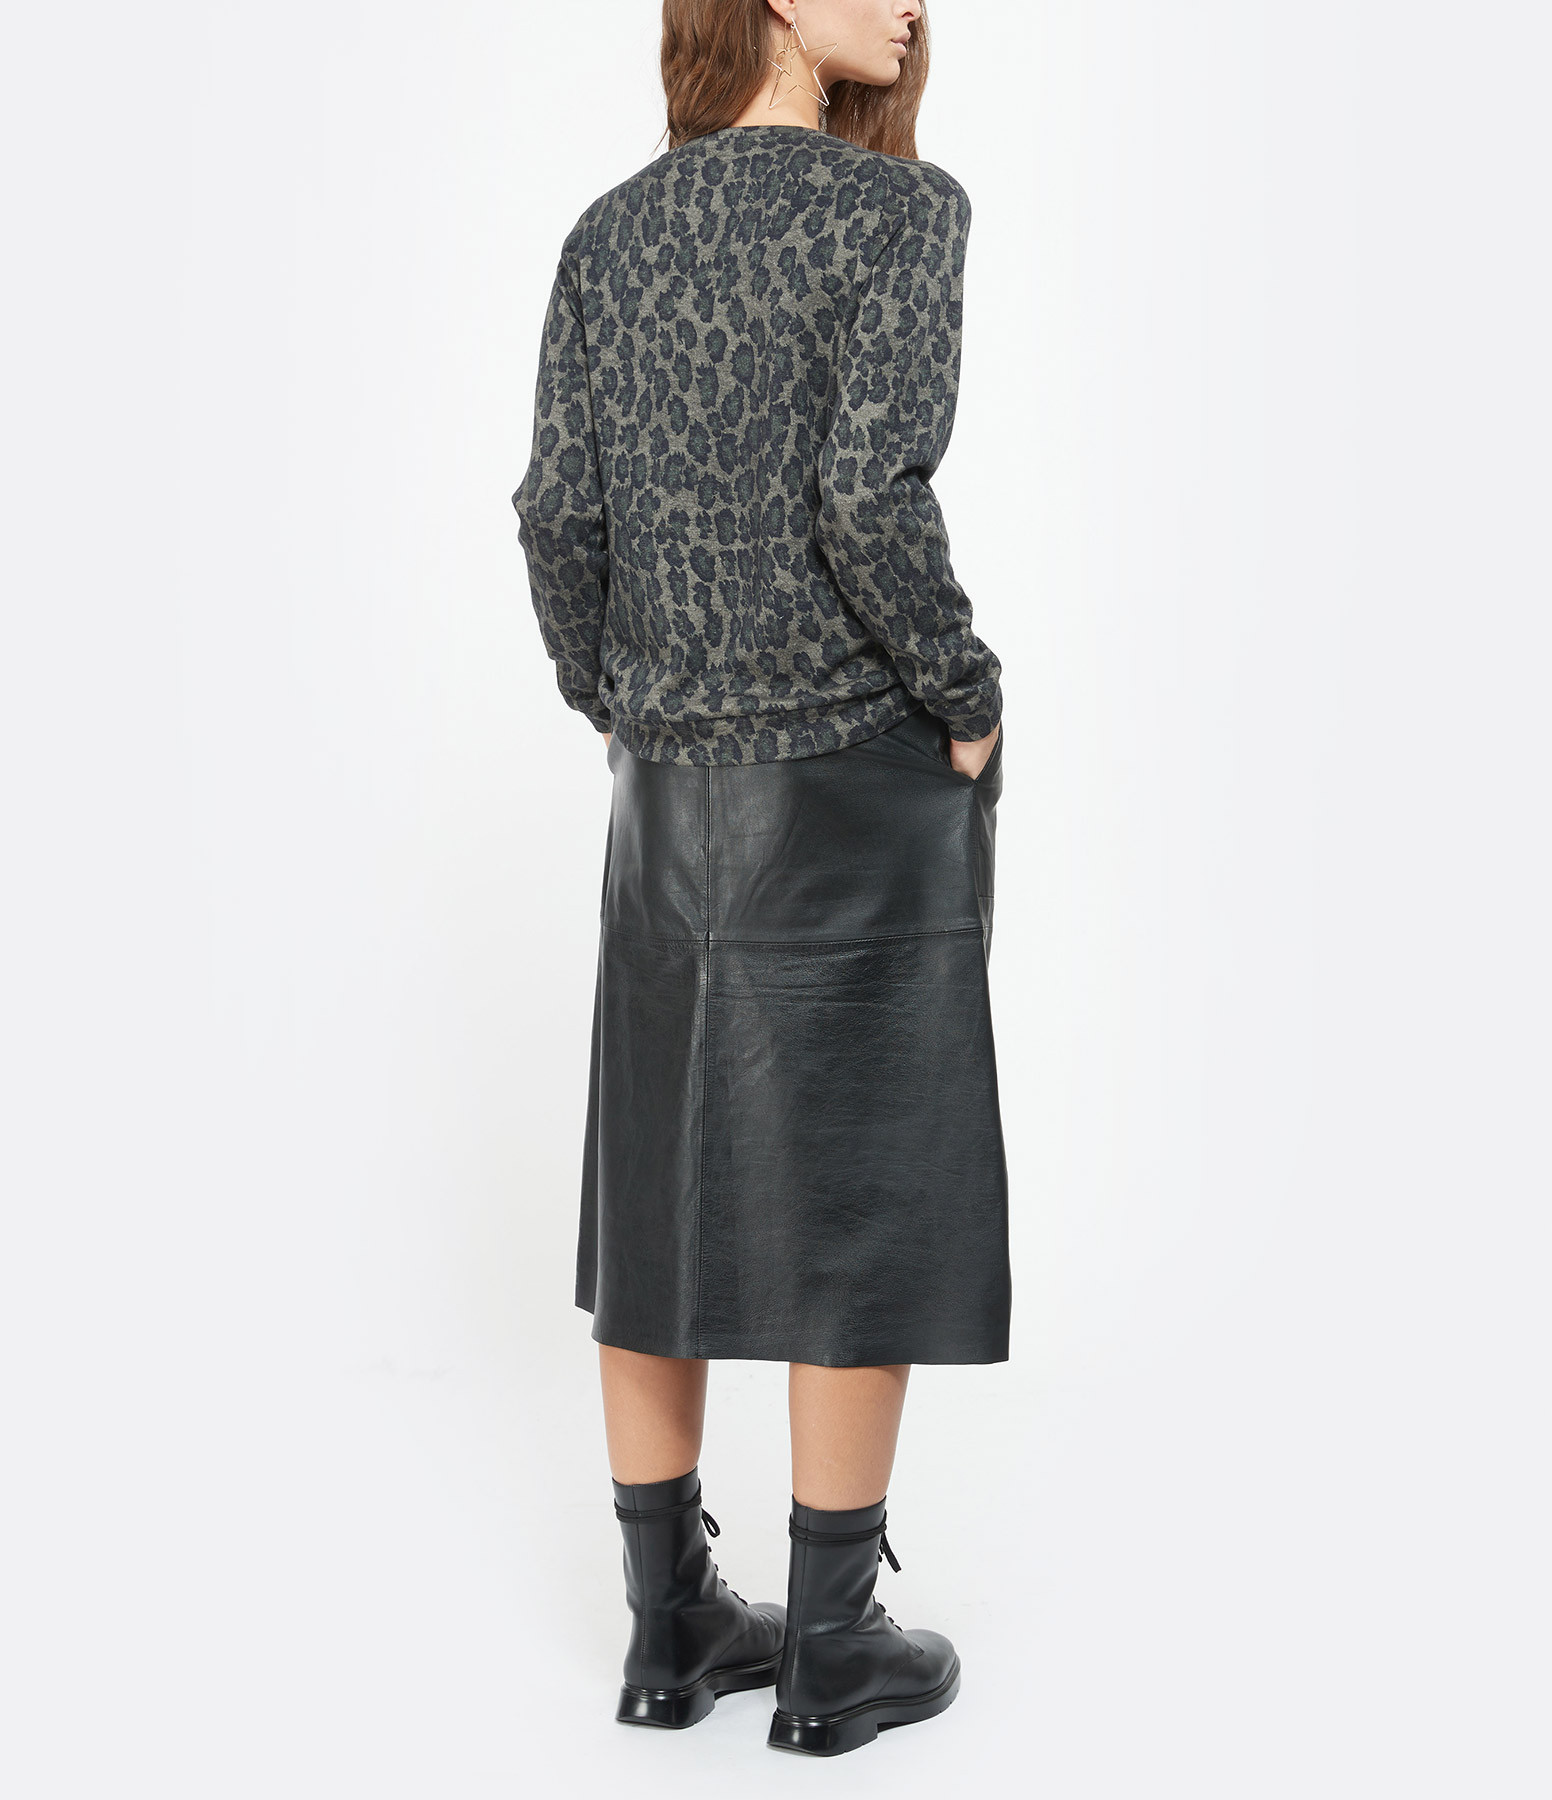 MAJESTIC FILATURES - Pull Coton Soie Imprimé Kaki